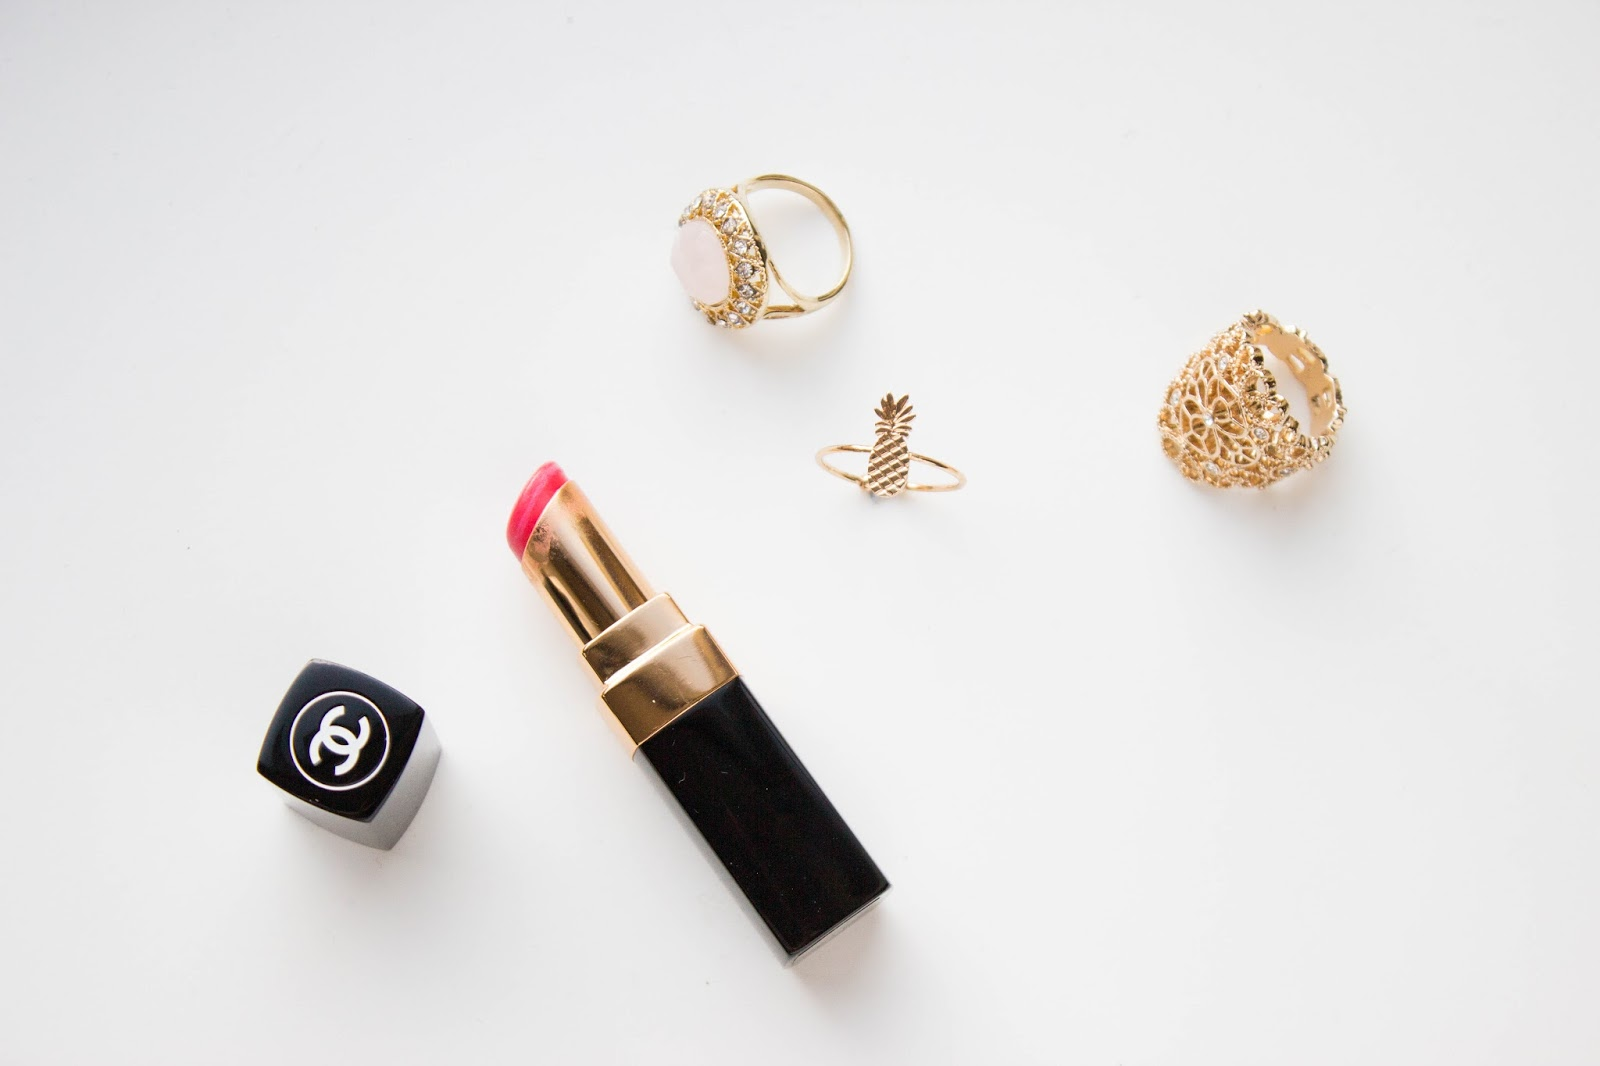 Beauty Mistakes, Teenage Beauty Tips, Life Lessons, Katie Writes,